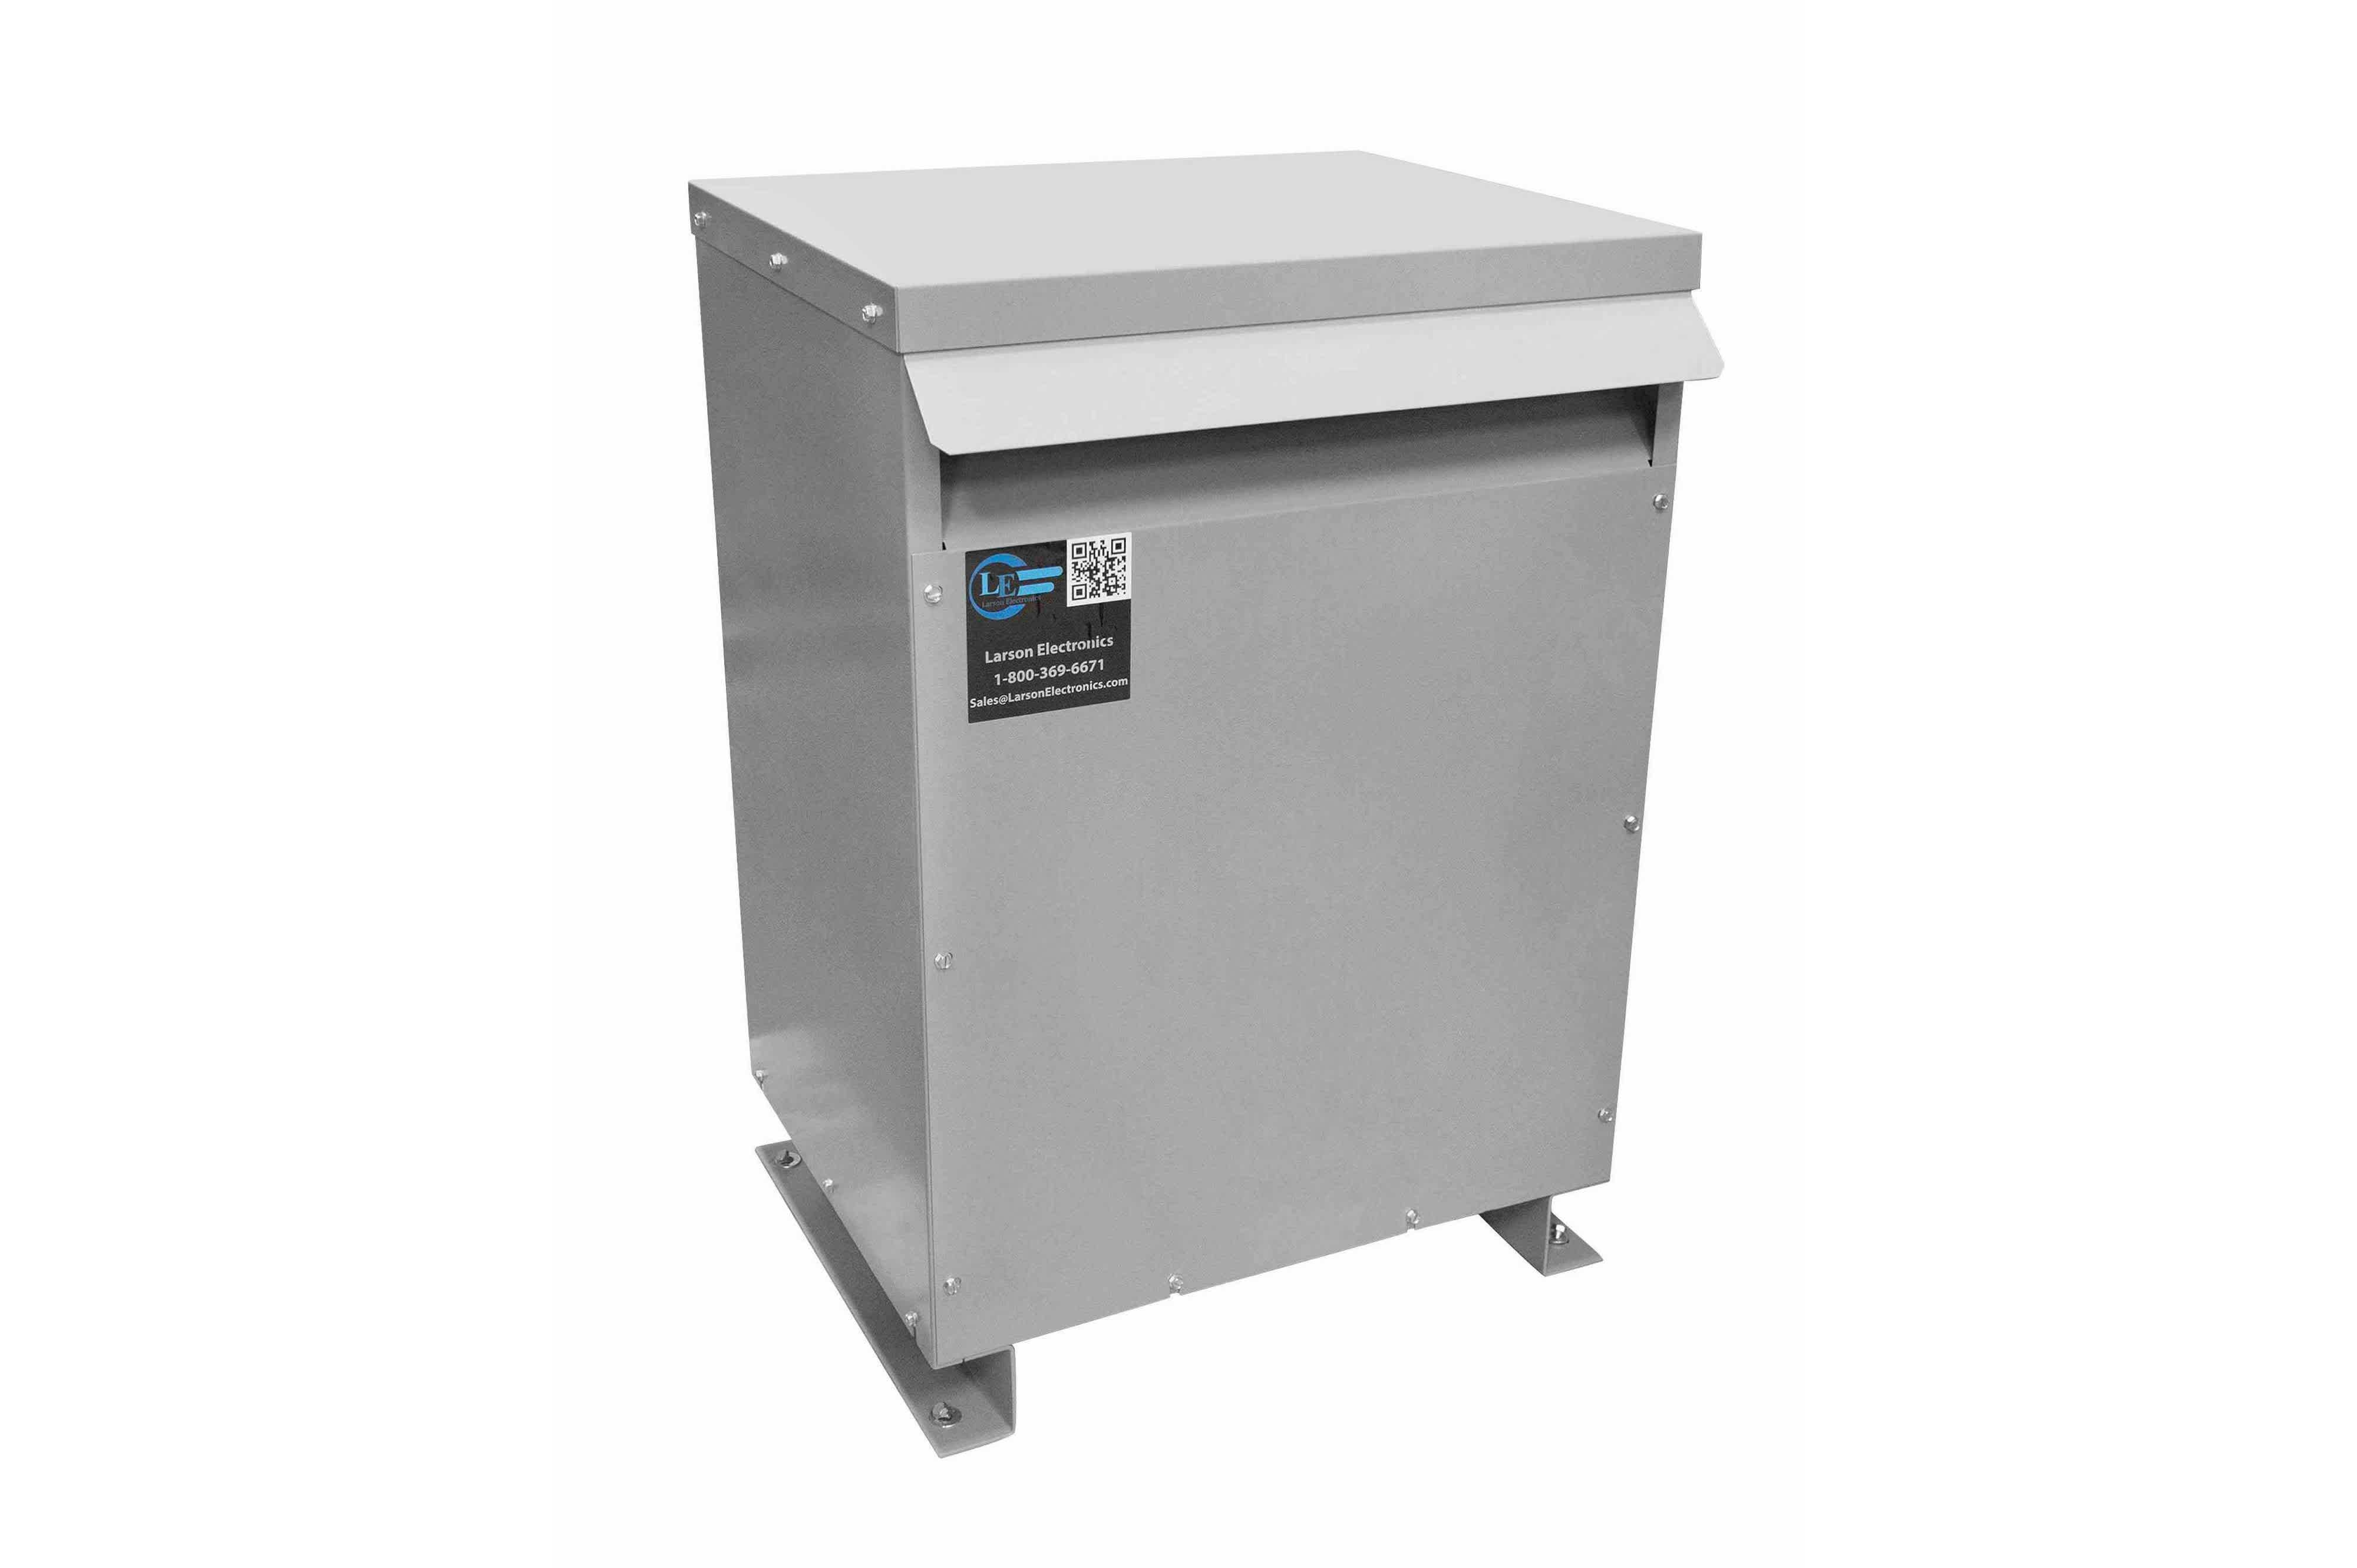 29 kVA 3PH Isolation Transformer, 460V Wye Primary, 240V Delta Secondary, N3R, Ventilated, 60 Hz